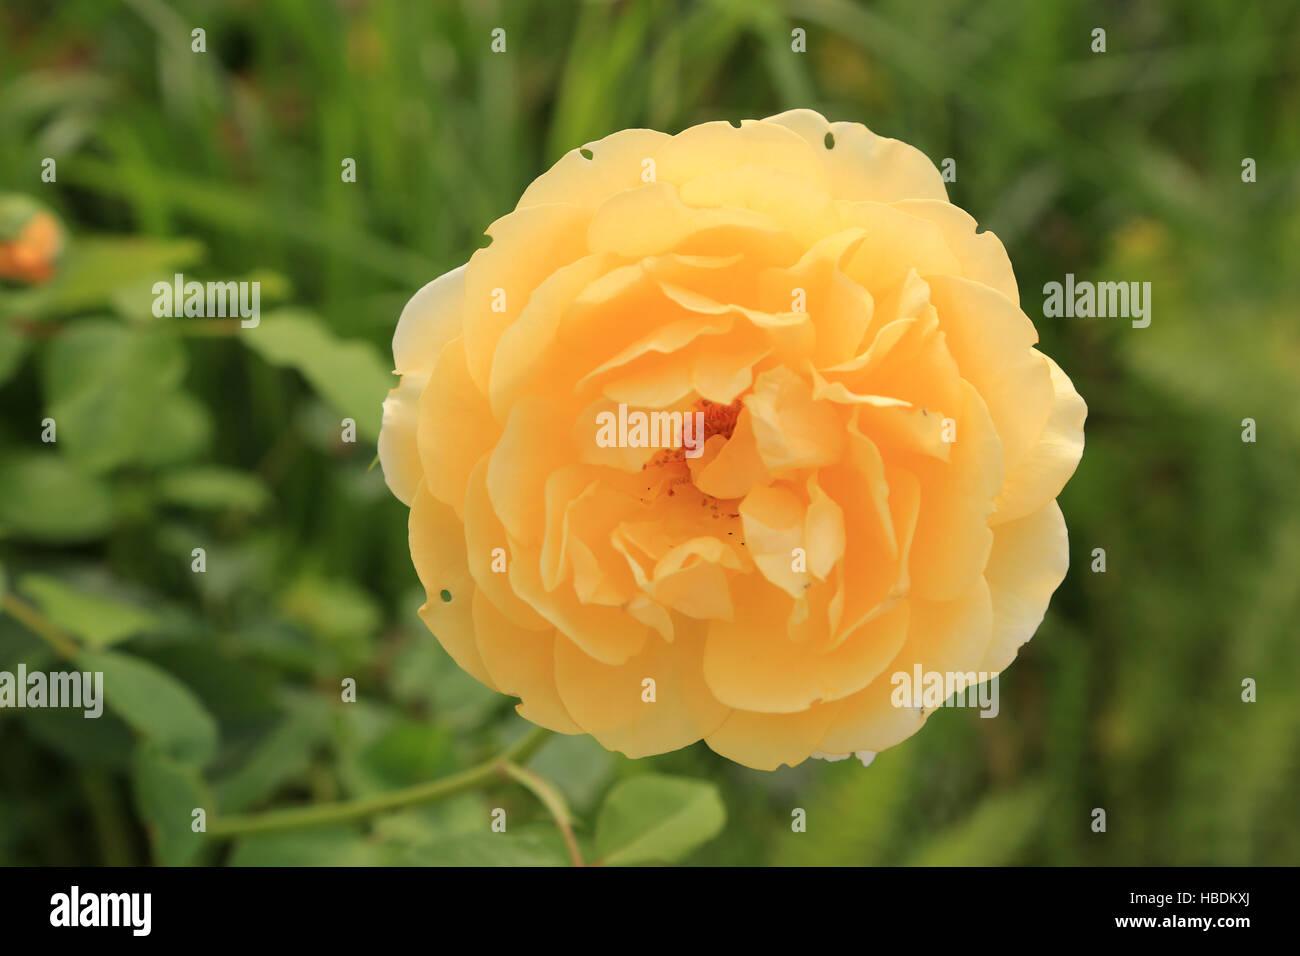 Rose graham thomas stock photo 127534810 alamy rose graham thomas thecheapjerseys Images